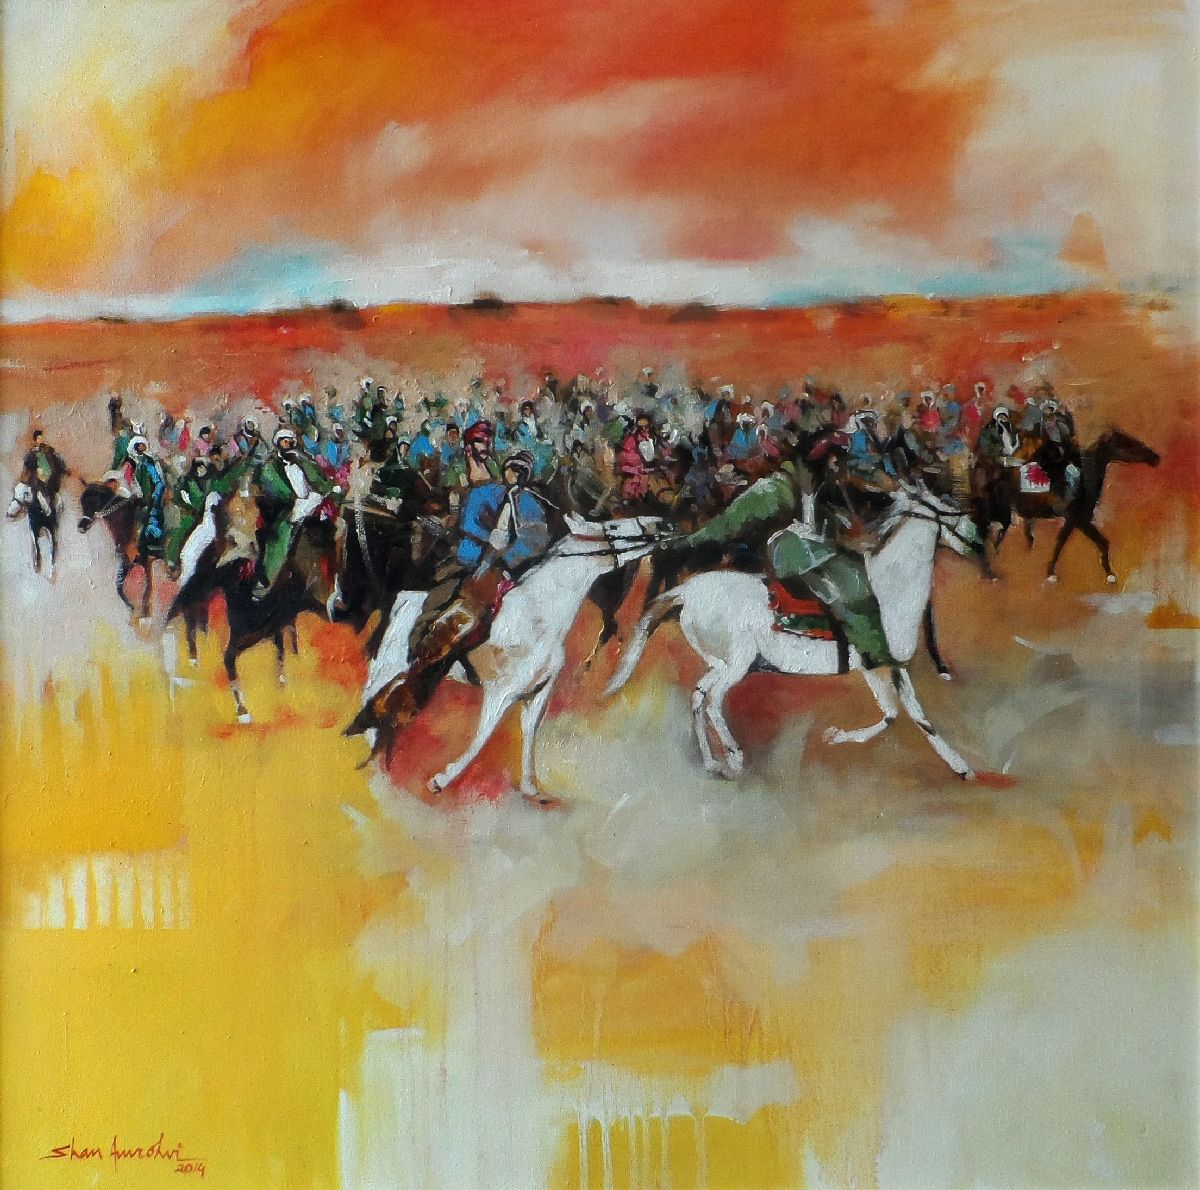 Artist: Shan Amrohvi Artwork Code: AC-SA-037 Medium: Oil on canvas Size: 30 x 30 inch